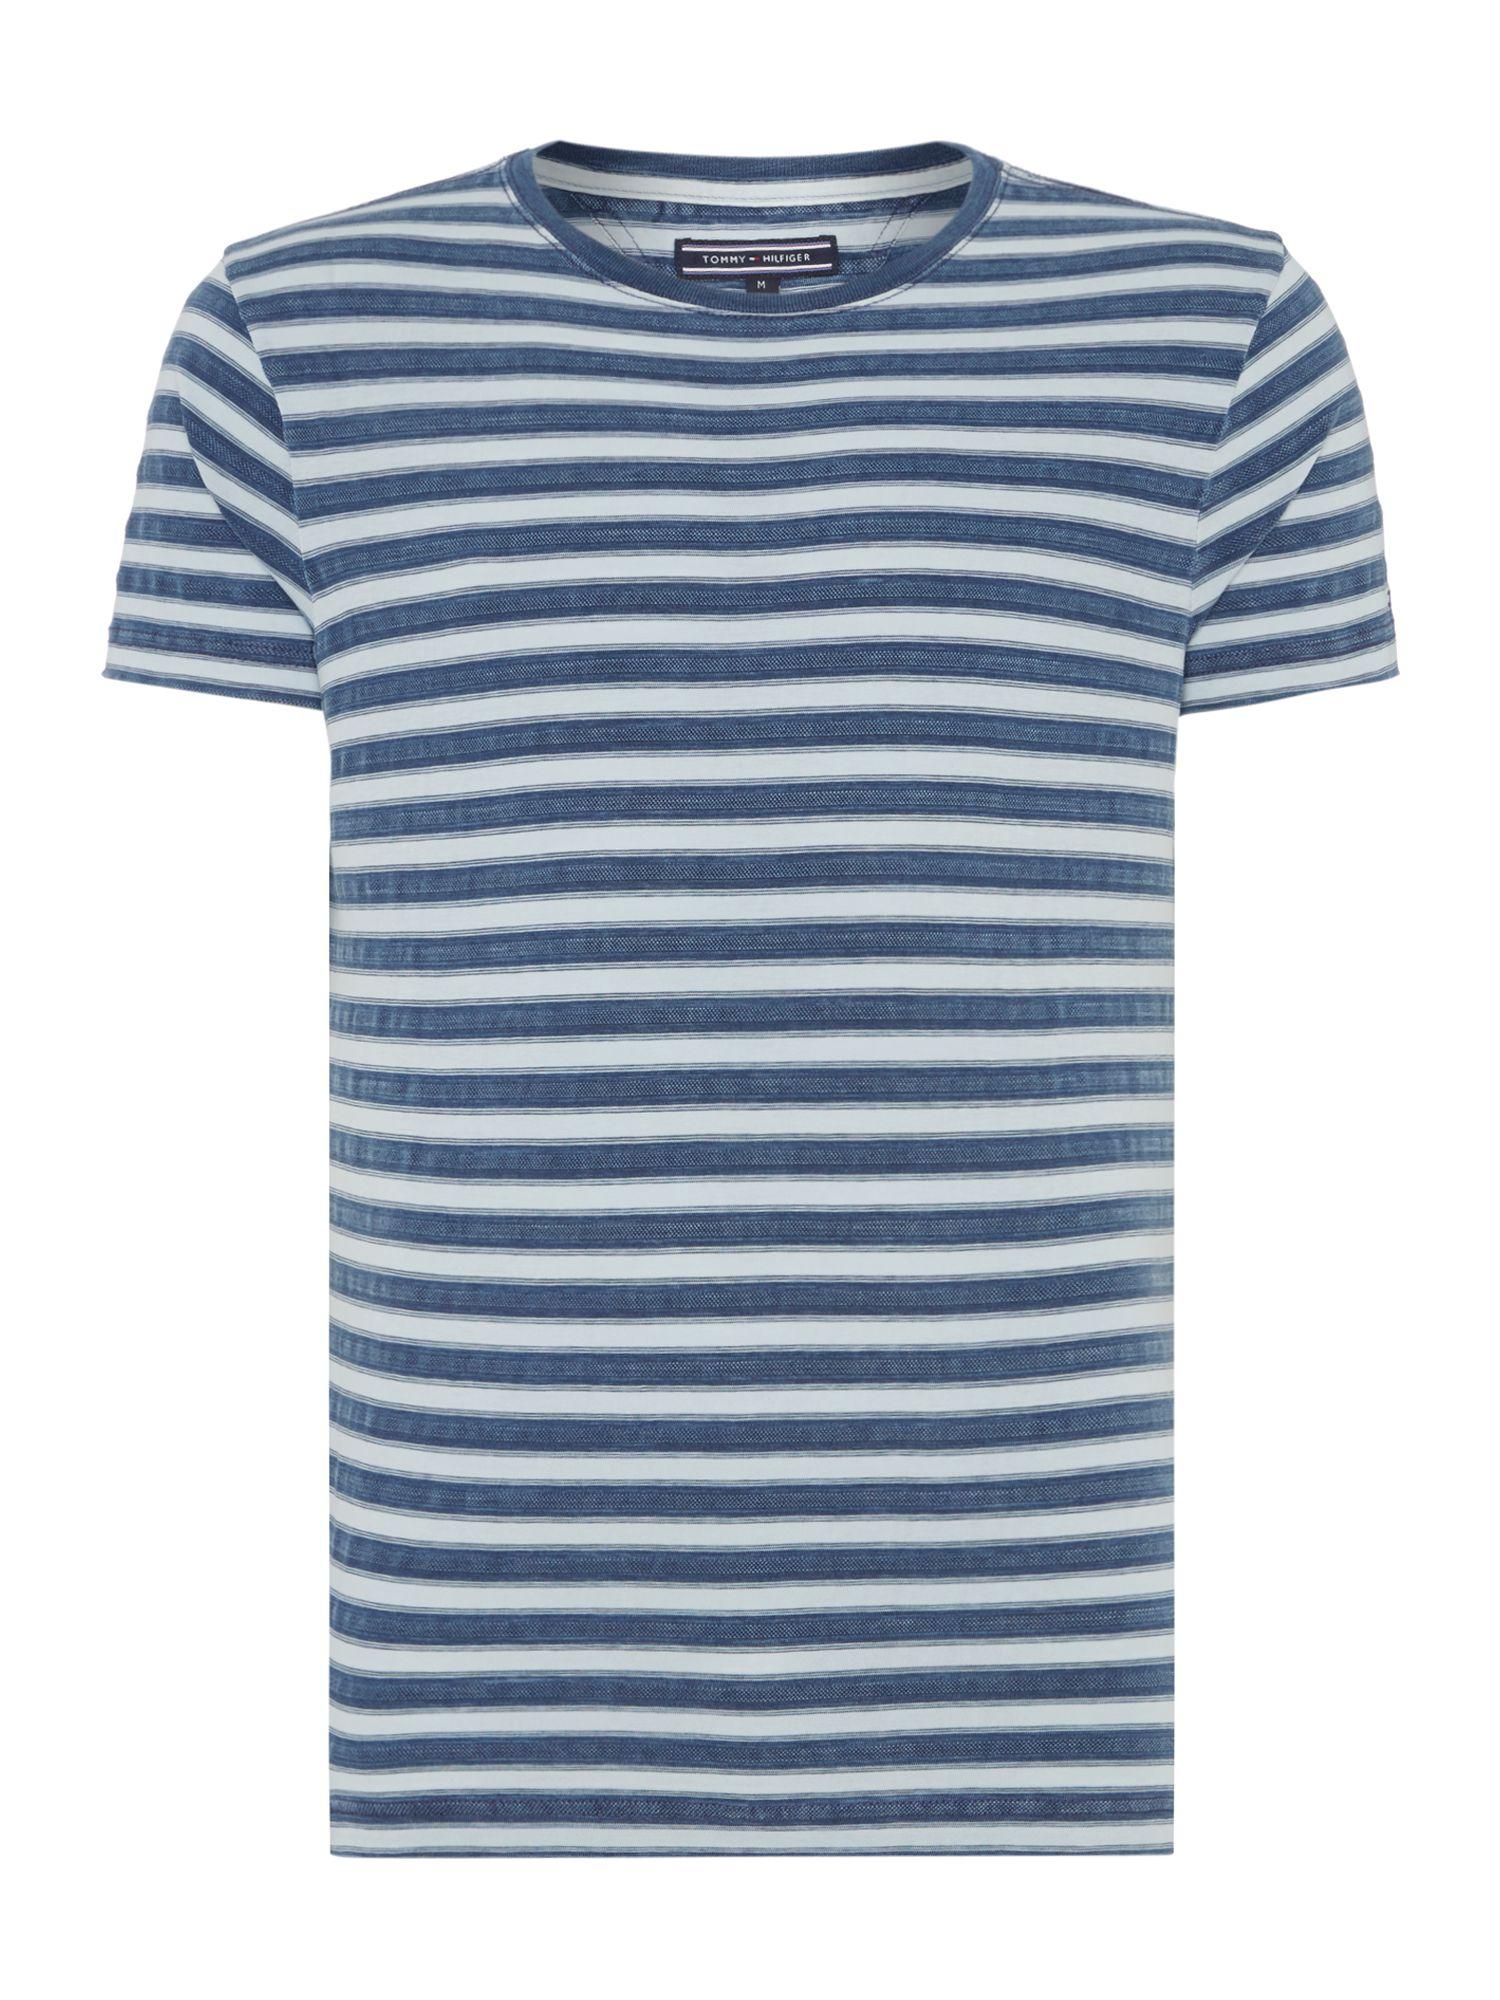 Tommy hilfiger sid stripe crew neck regular fit t shirt in for Tommy hilfiger fitzgerald striped shirt